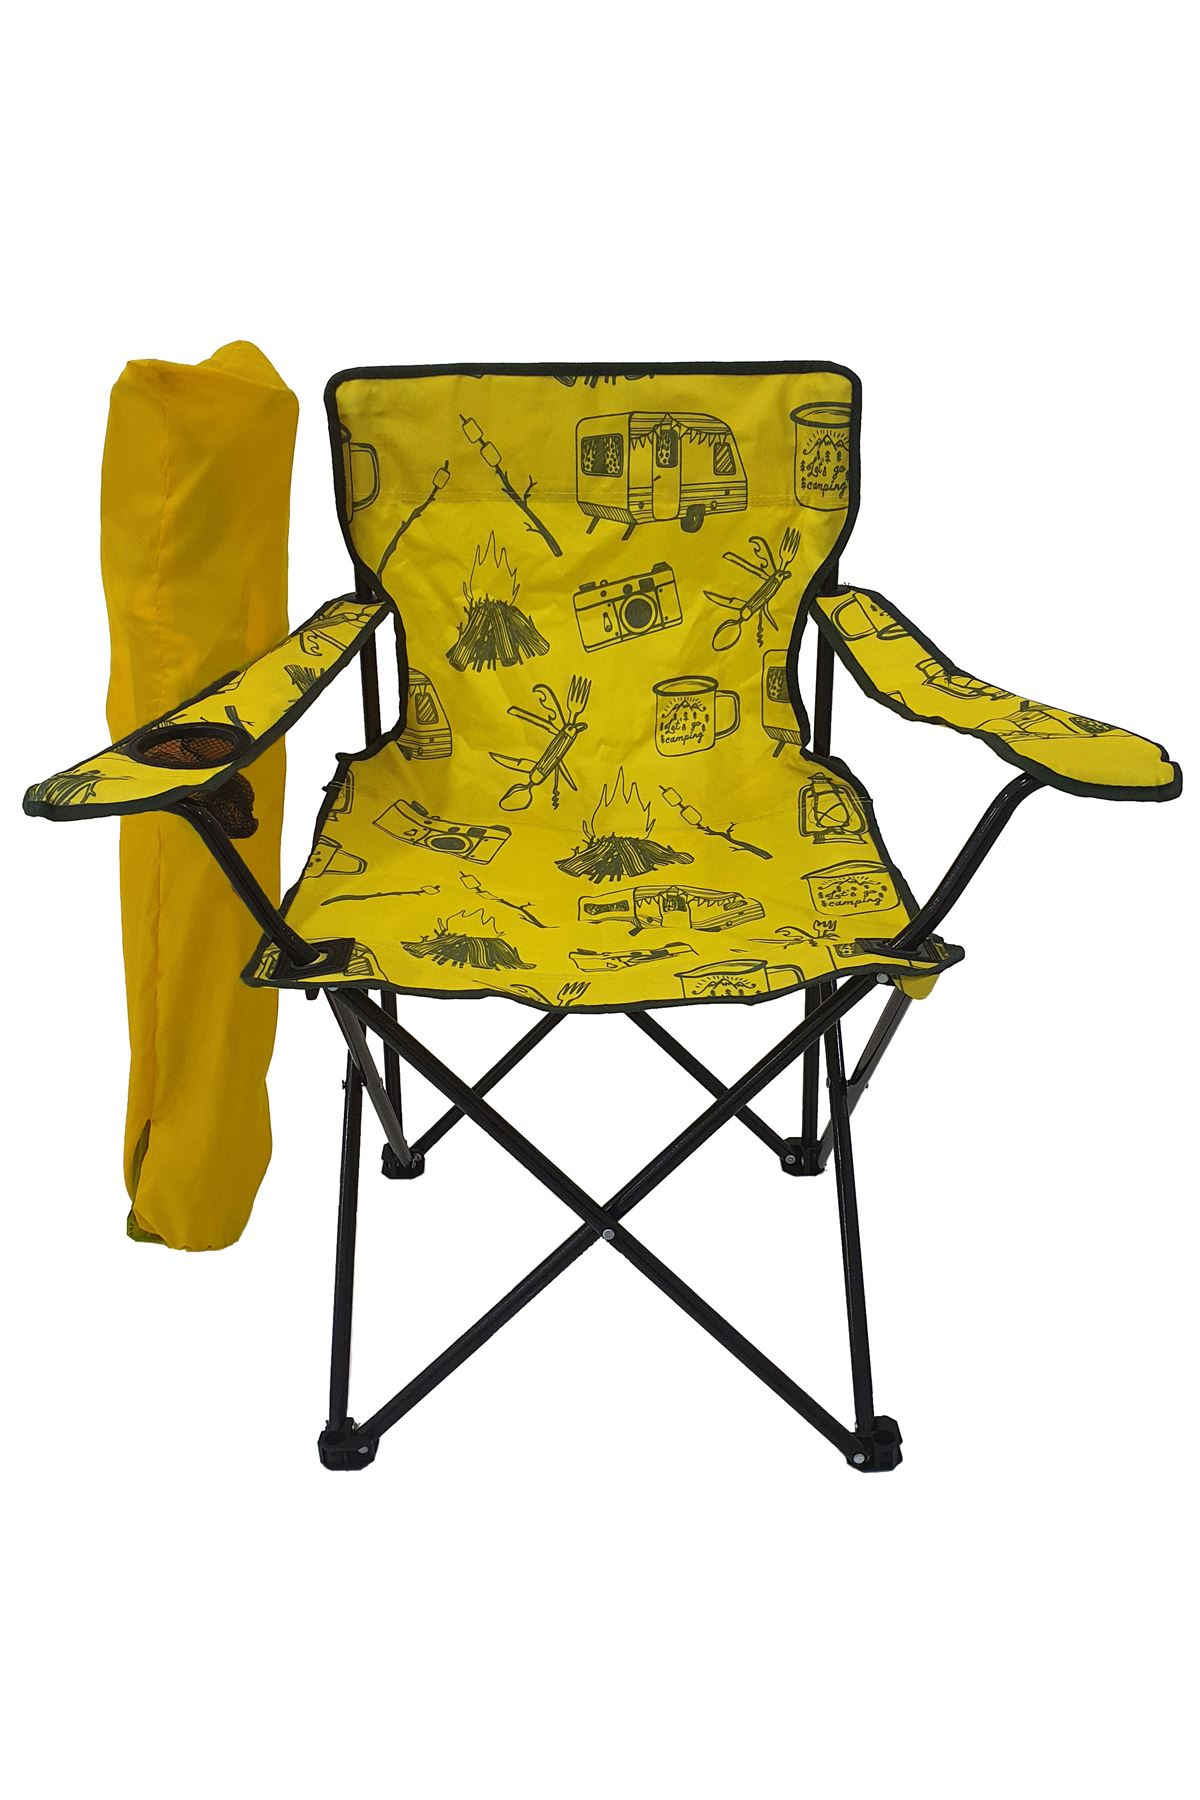 Bofigo Camping Chair Folding Chair Garden Chair Picnic Beach Balcony Chair Patterned Yellow